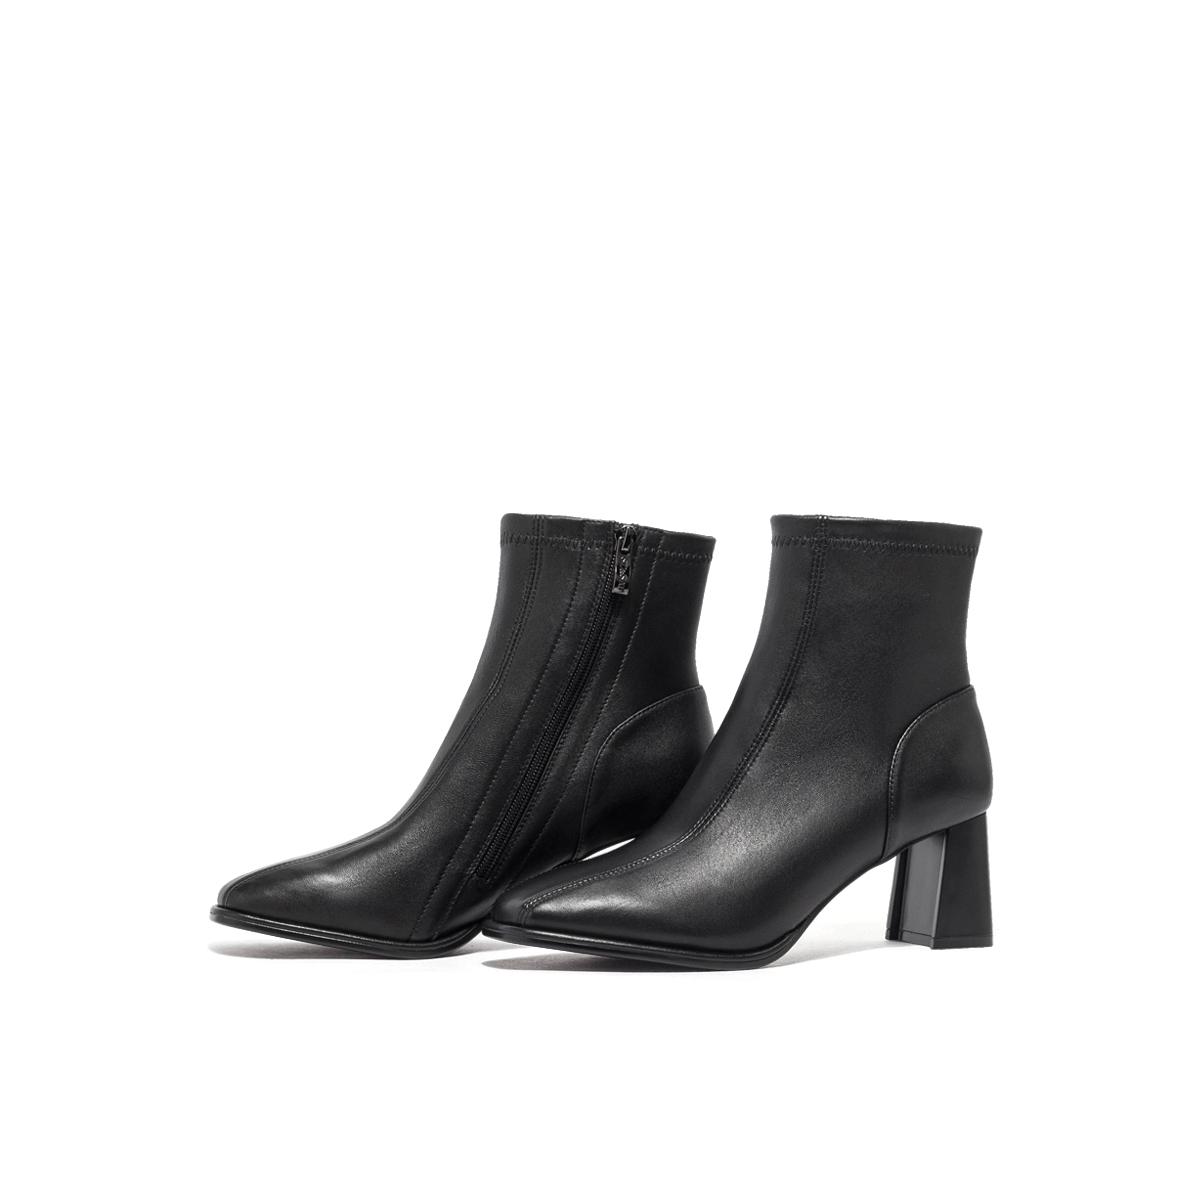 SS04116655 冬季新款短靴简约纯色侧拉链粗跟女靴时装靴 2020 星期六